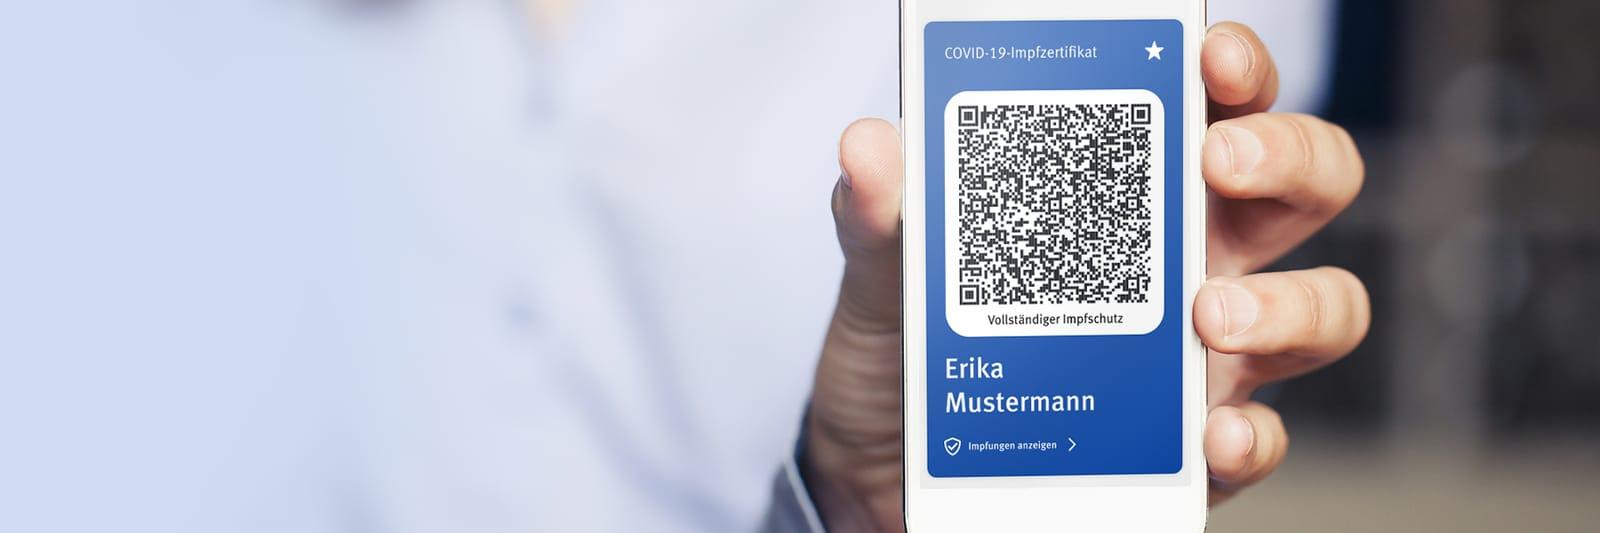 Der digitale COVID-19-Impfpass kostenlos!